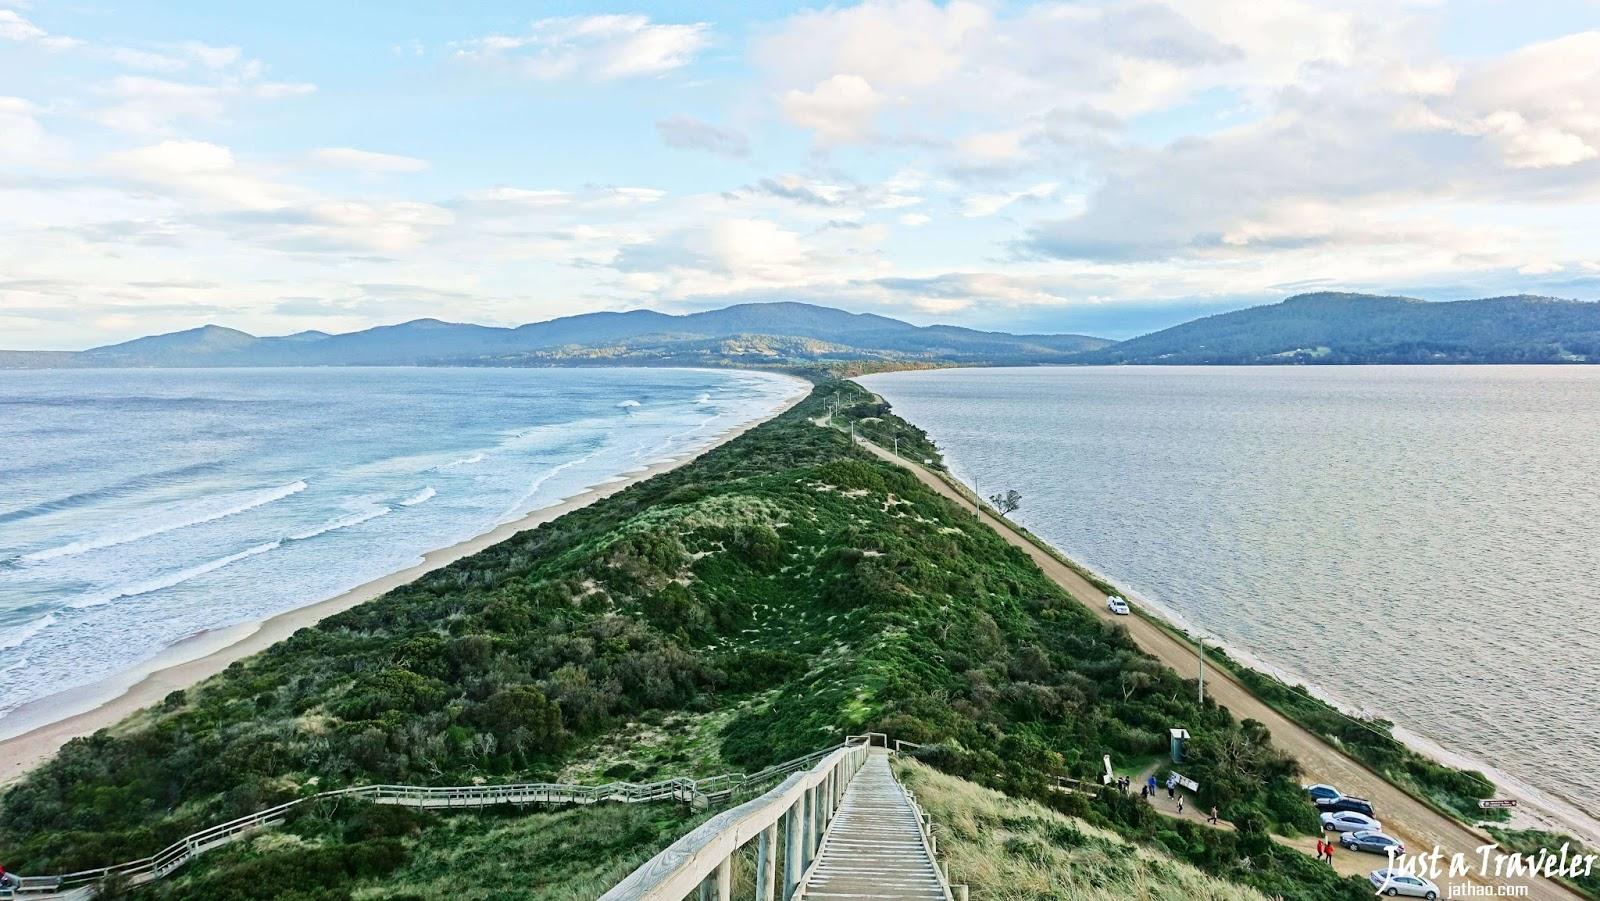 塔斯馬尼亞-景點-推薦-布魯尼島-自由行-旅遊-澳洲-Tasmania-Tourist-Attraction-Bruny-Island-The-Neck-travel-australia